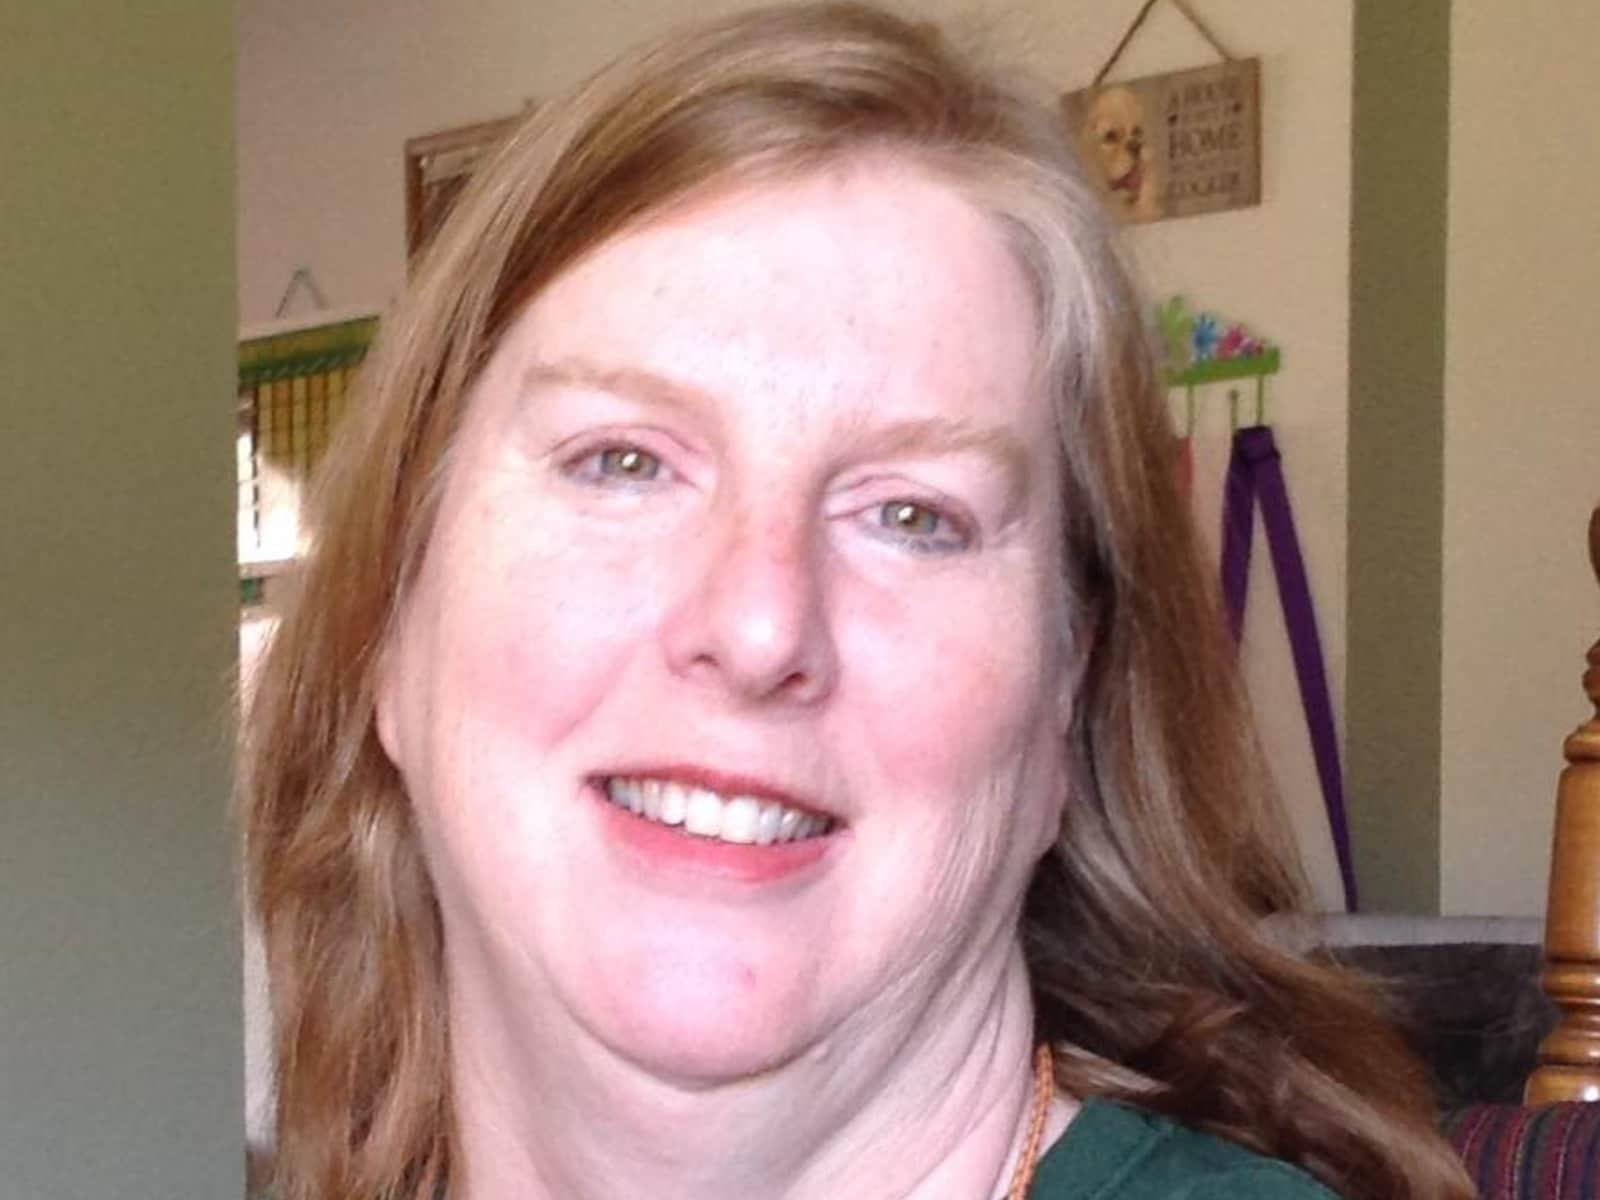 Peggy from Overland Park, Kansas, United States